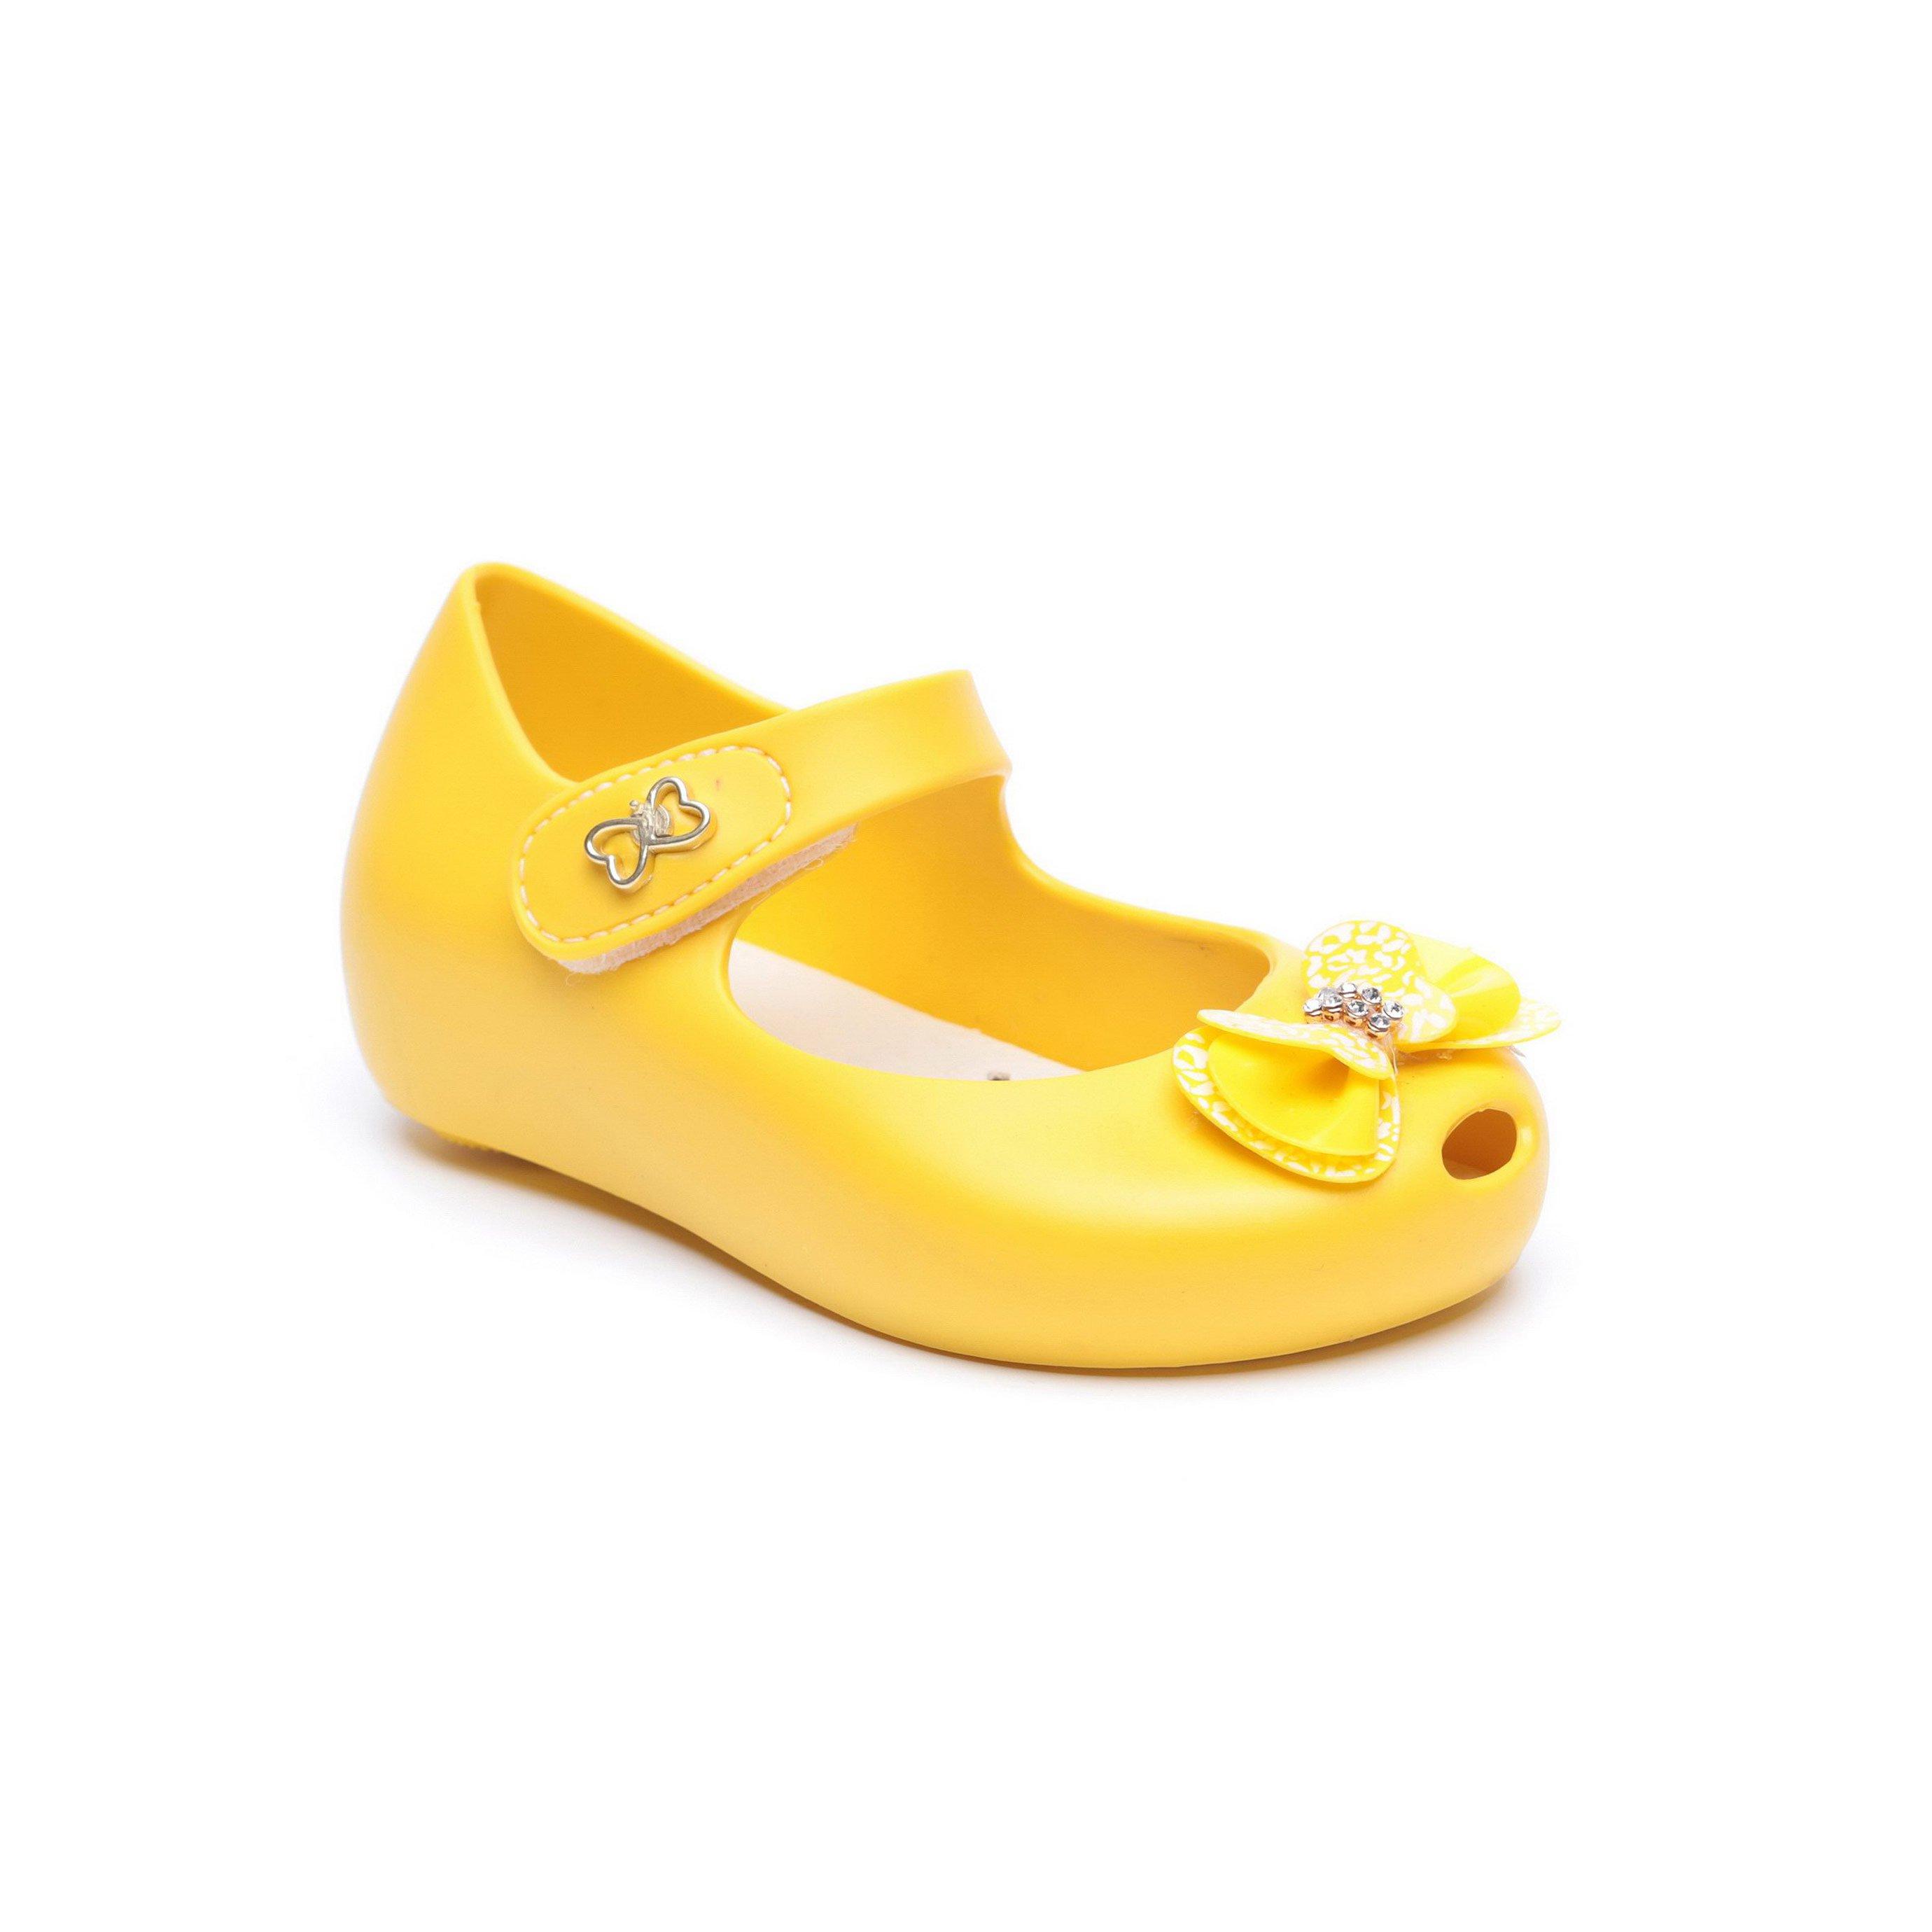 Candy - נעלי בובה לילדות בצבע צהוב בעיטור פפיון